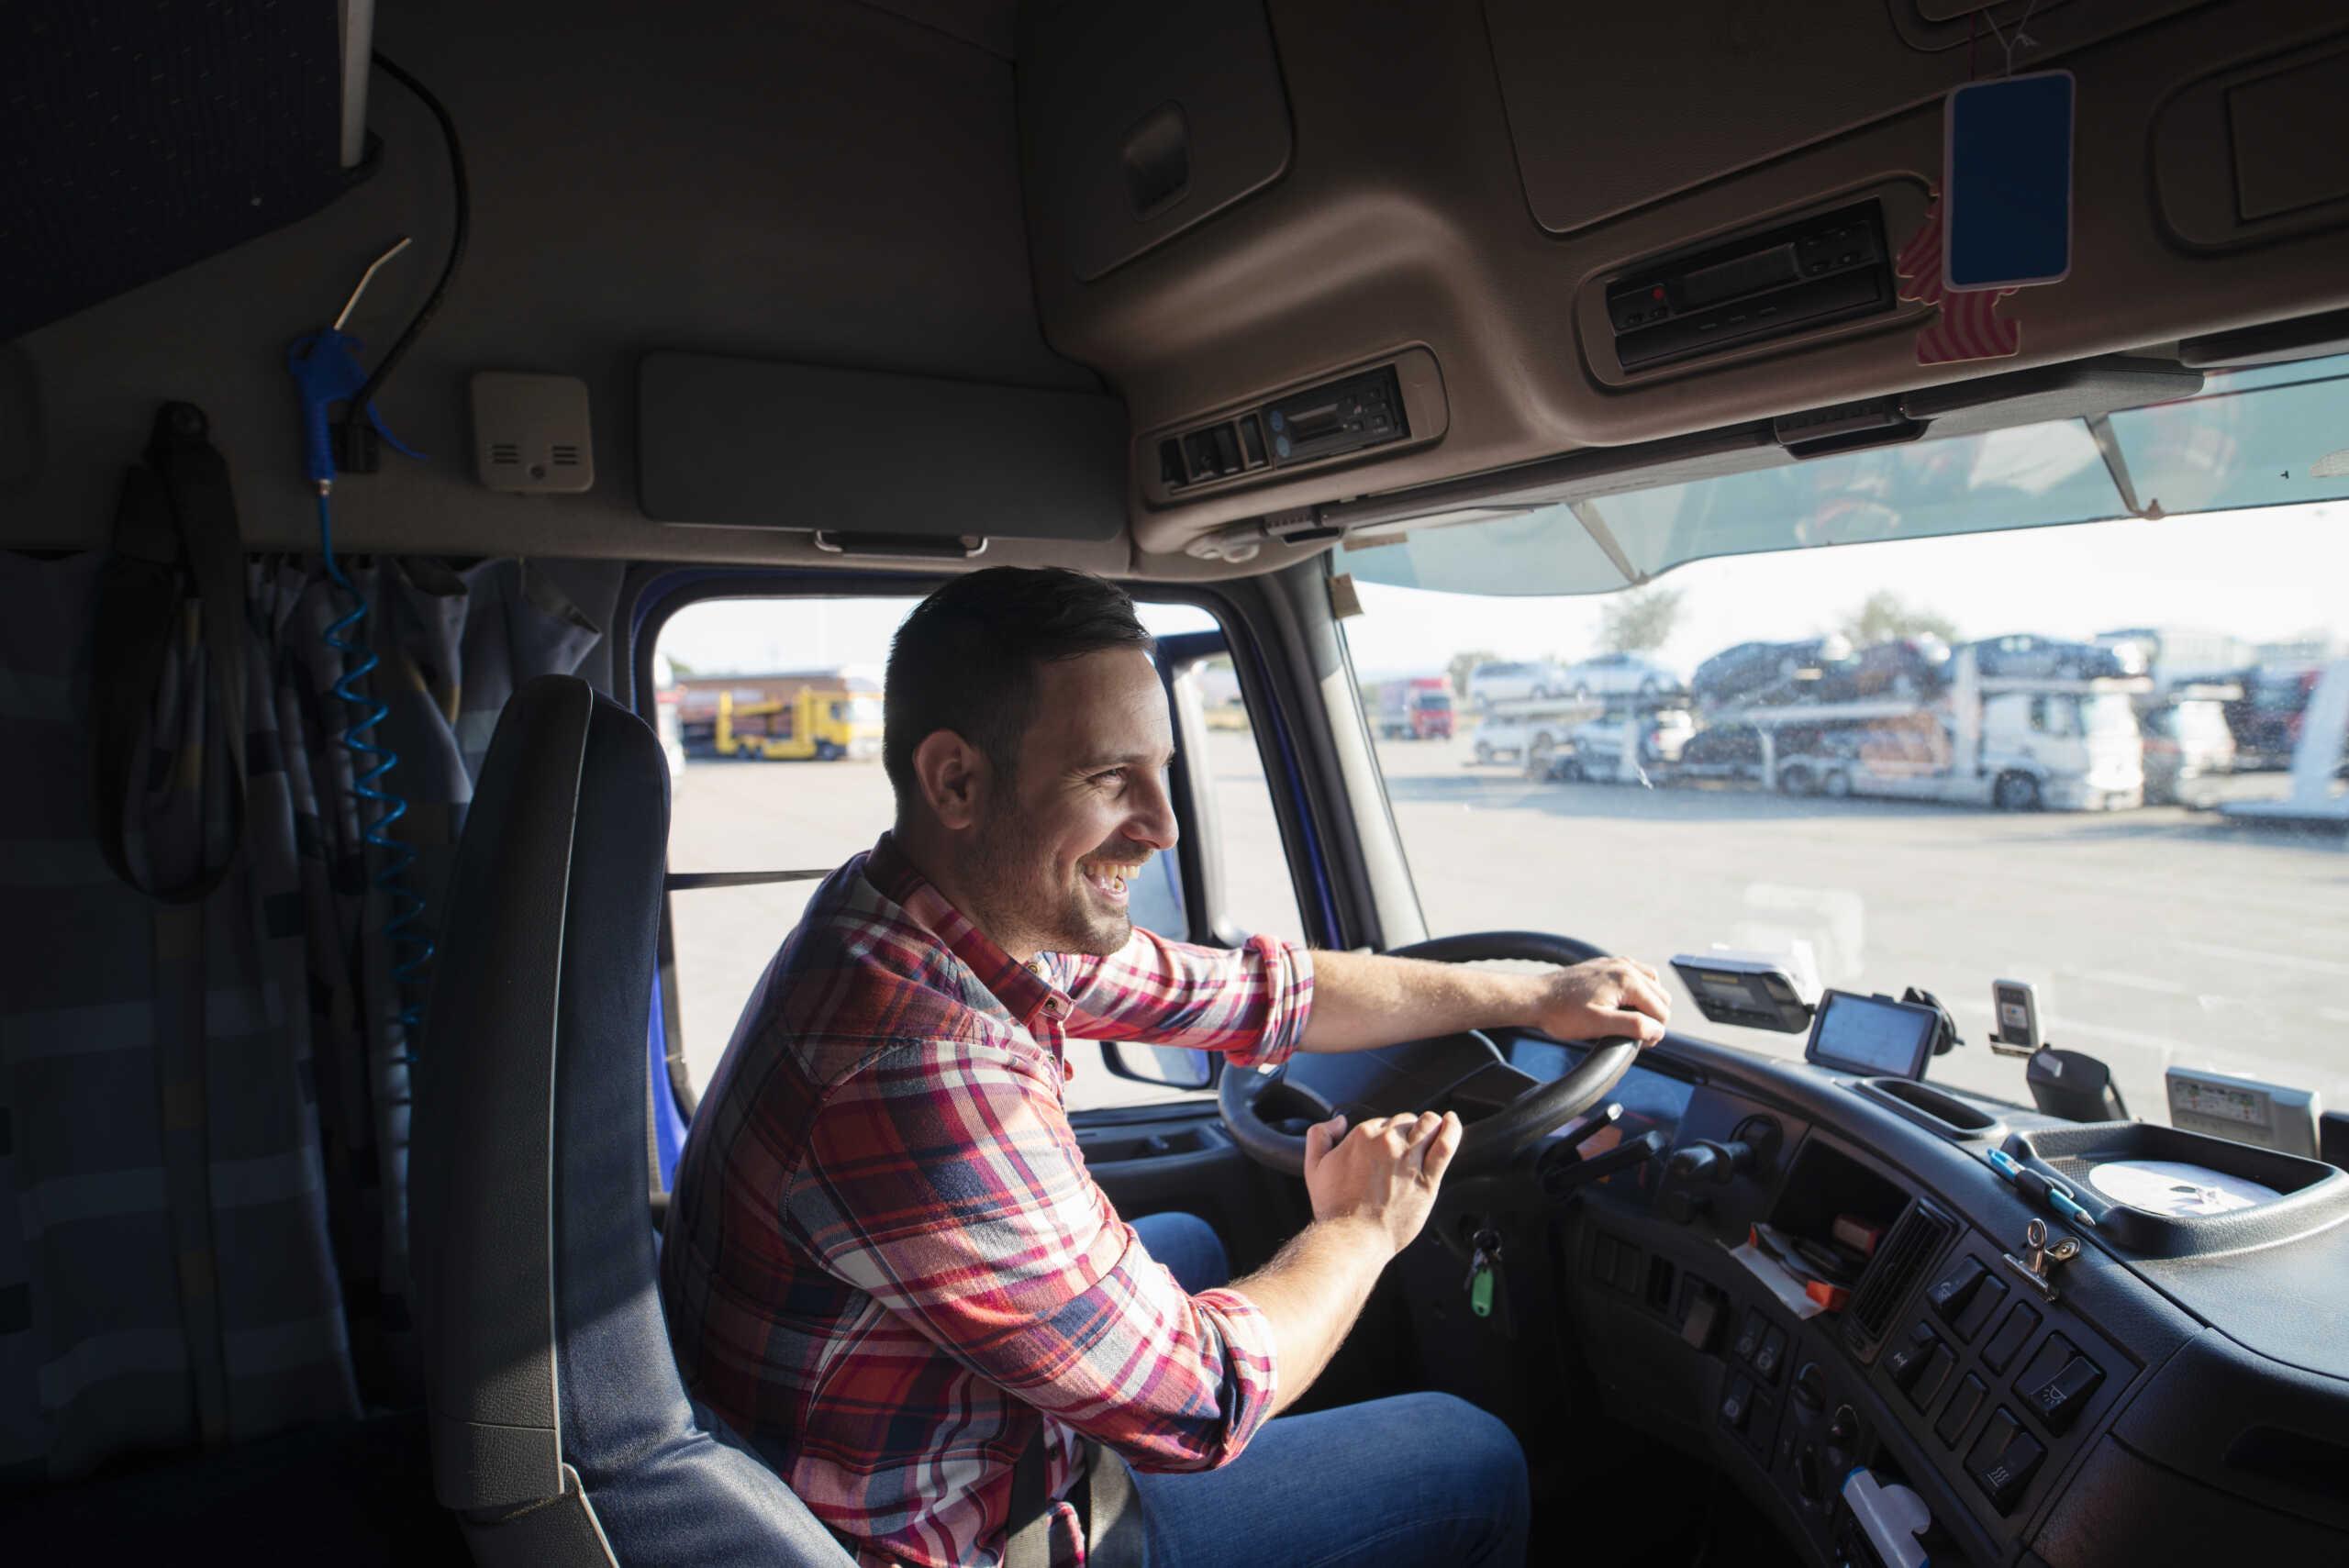 Cleveland trucking companies